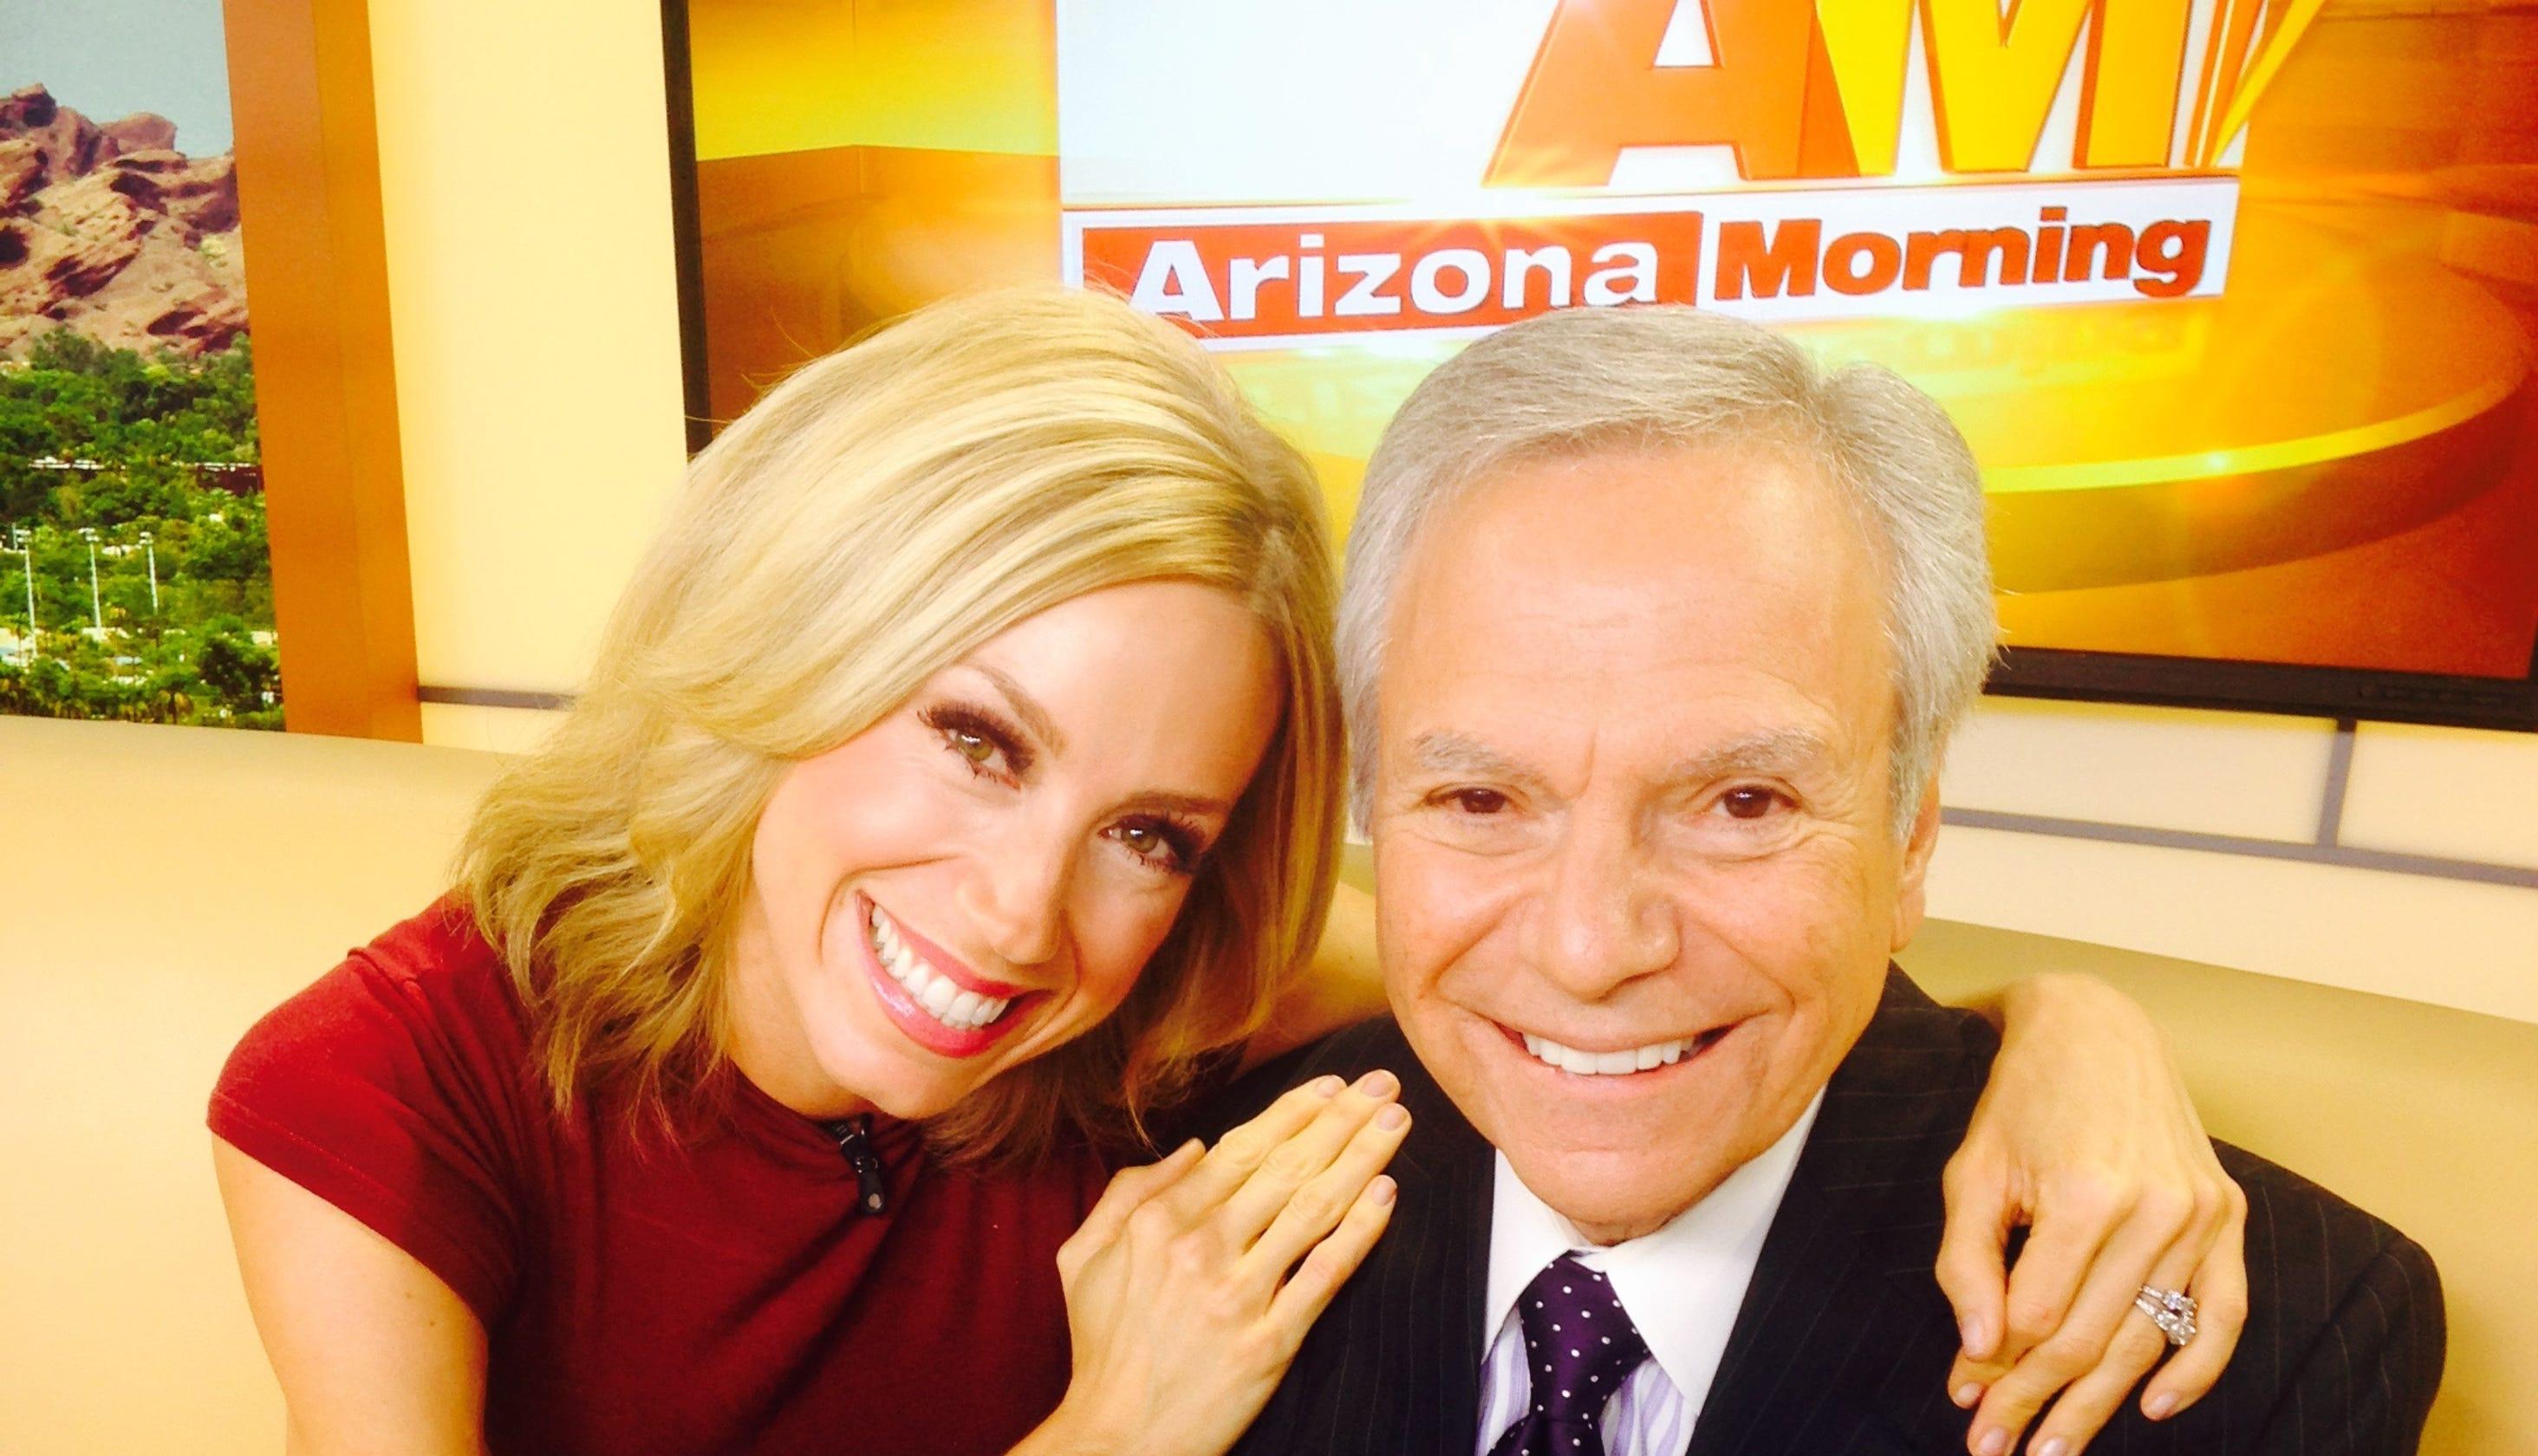 Phoenix TV anchor Andrea Robinson leaving Fox 10 morning show